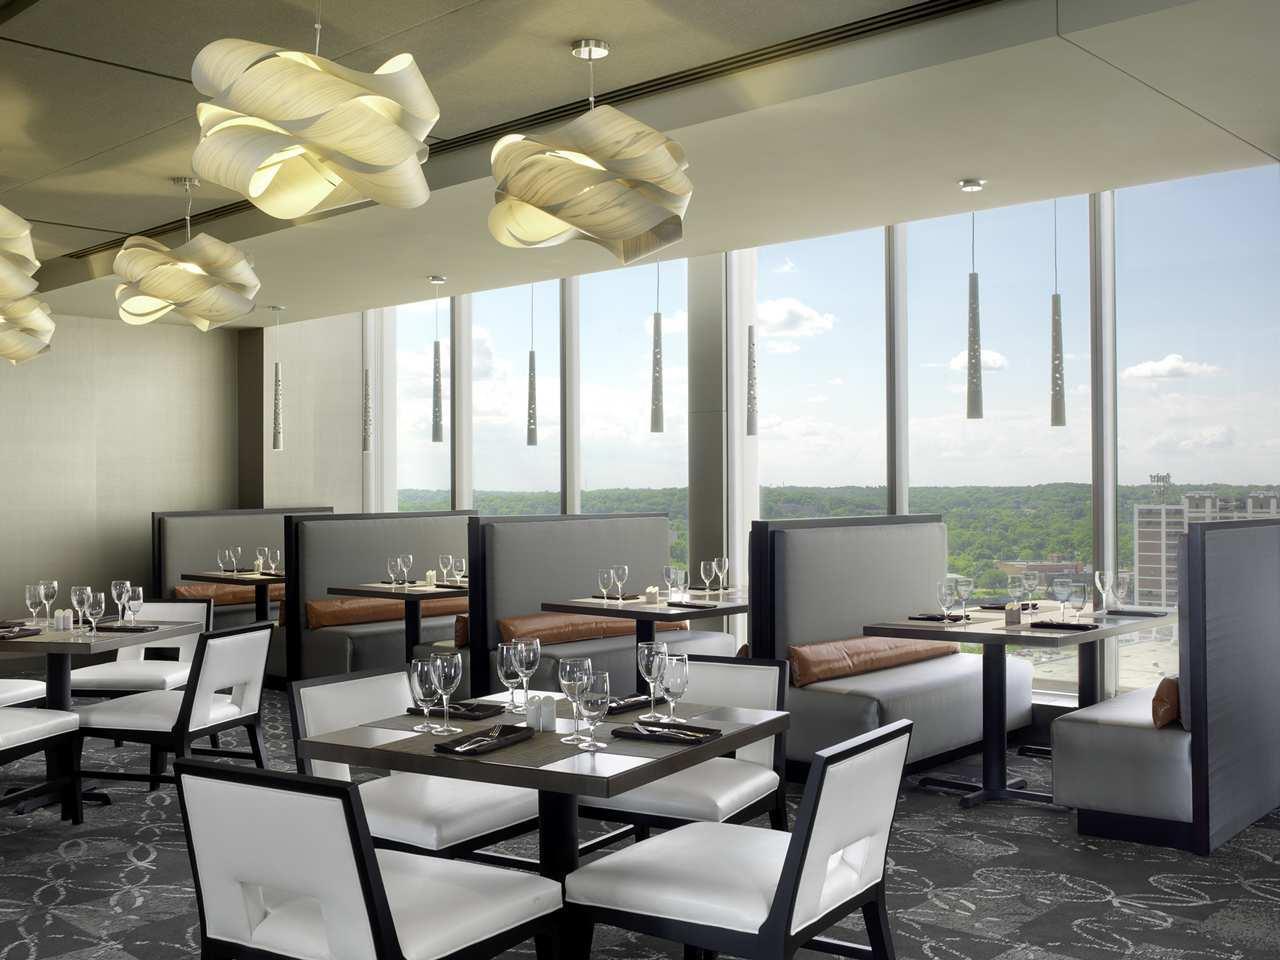 DoubleTree by Hilton Hotel Cedar Rapids Convention Complex image 6